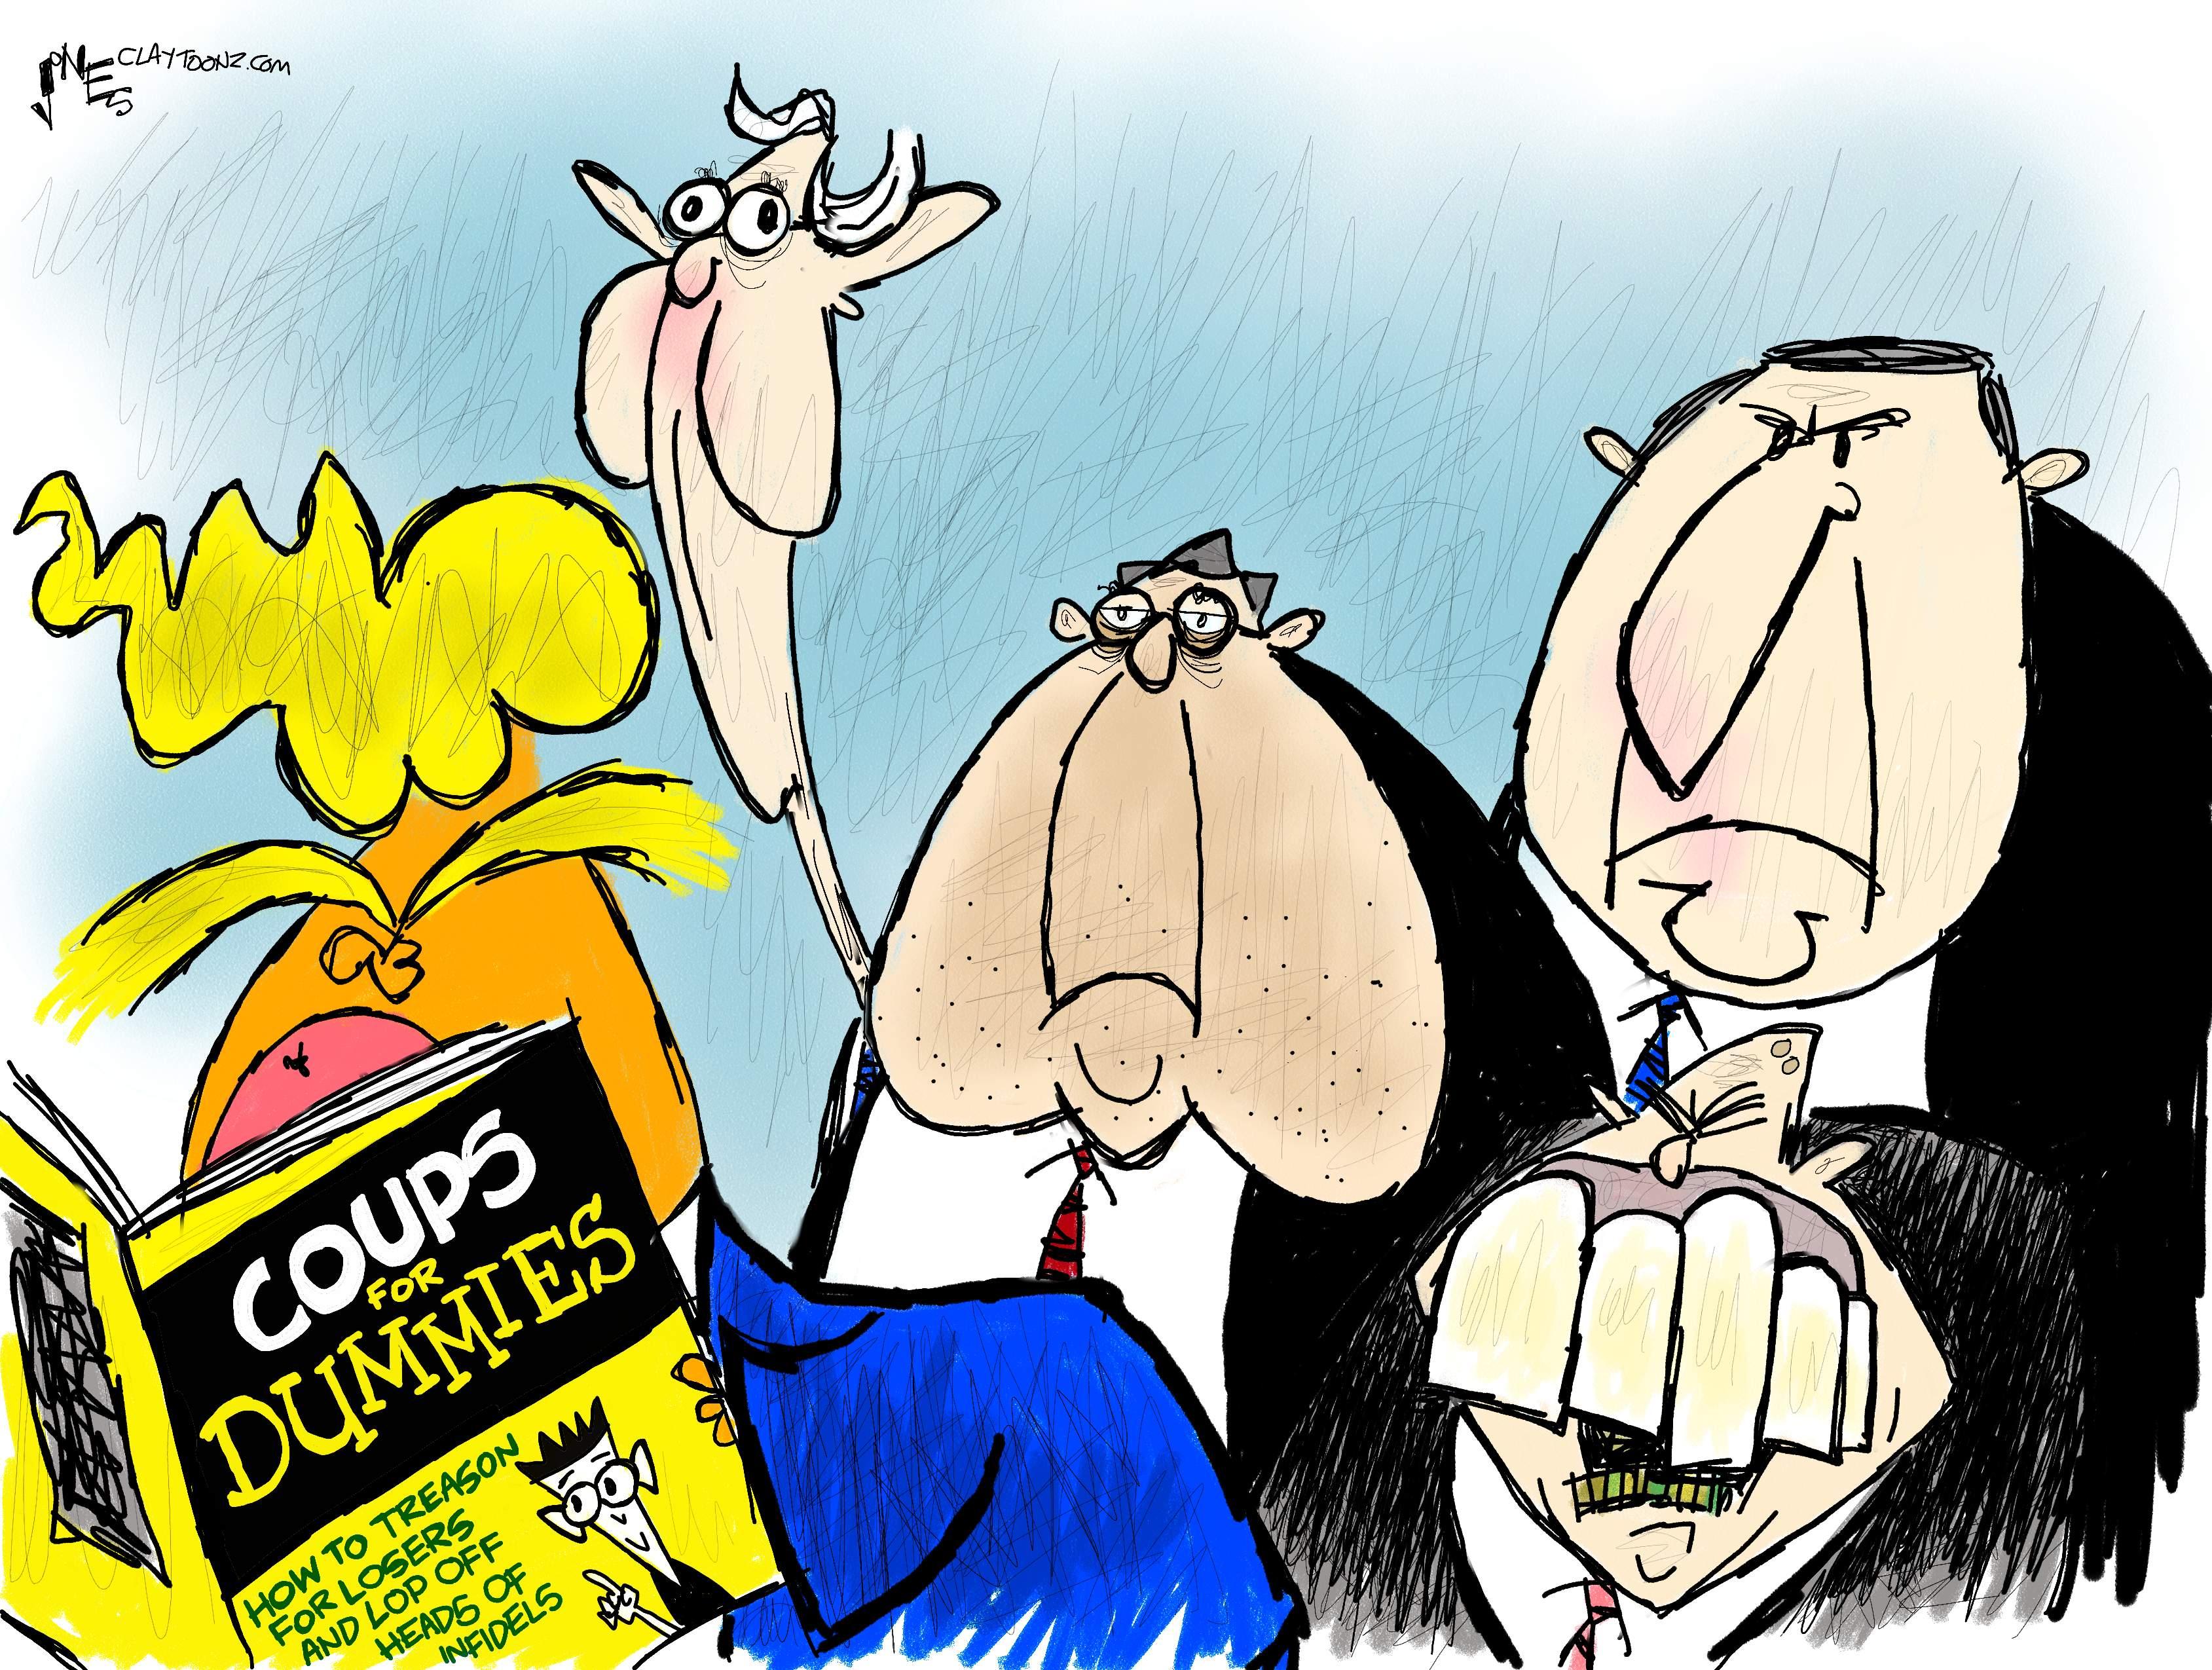 claytoonz | Nationally Syndicated Editorial Cartoonist